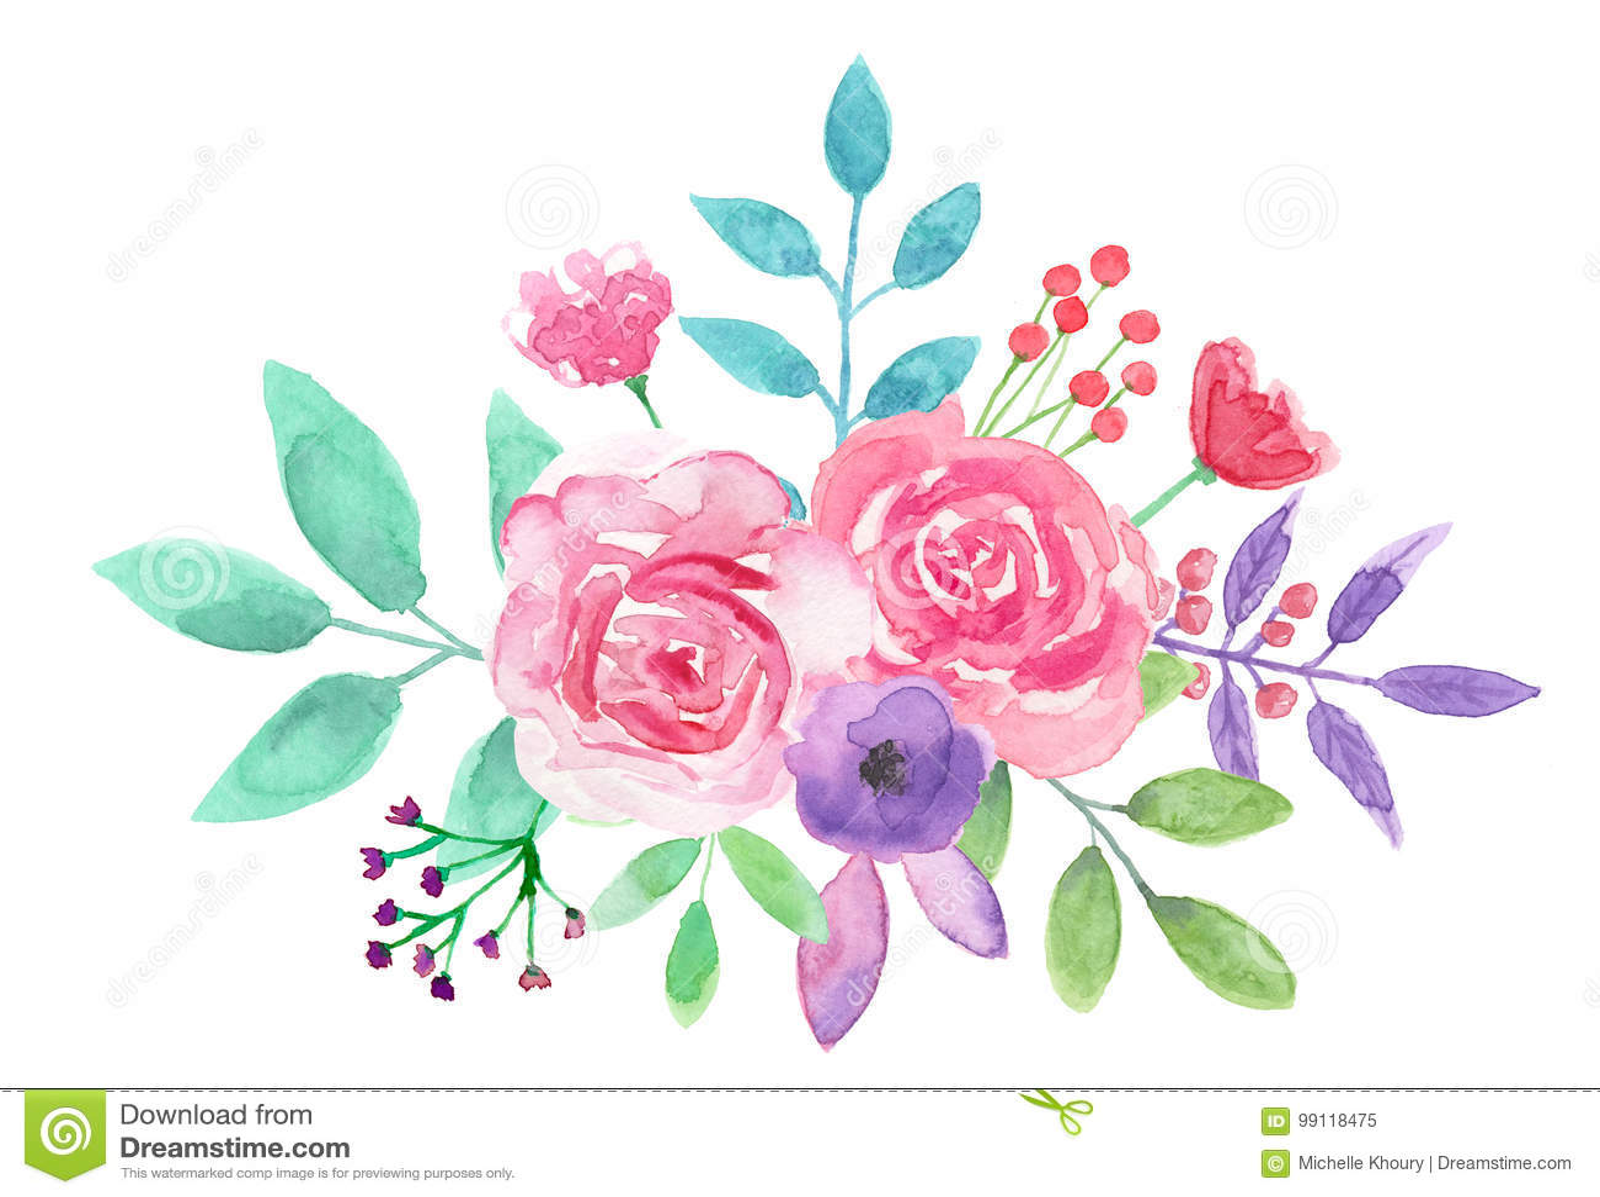 Watercolor Flower Arrangement Pink Floral Hand Painted Bouquet Stock Illustration Illustration Of Flower Mauve 99118475